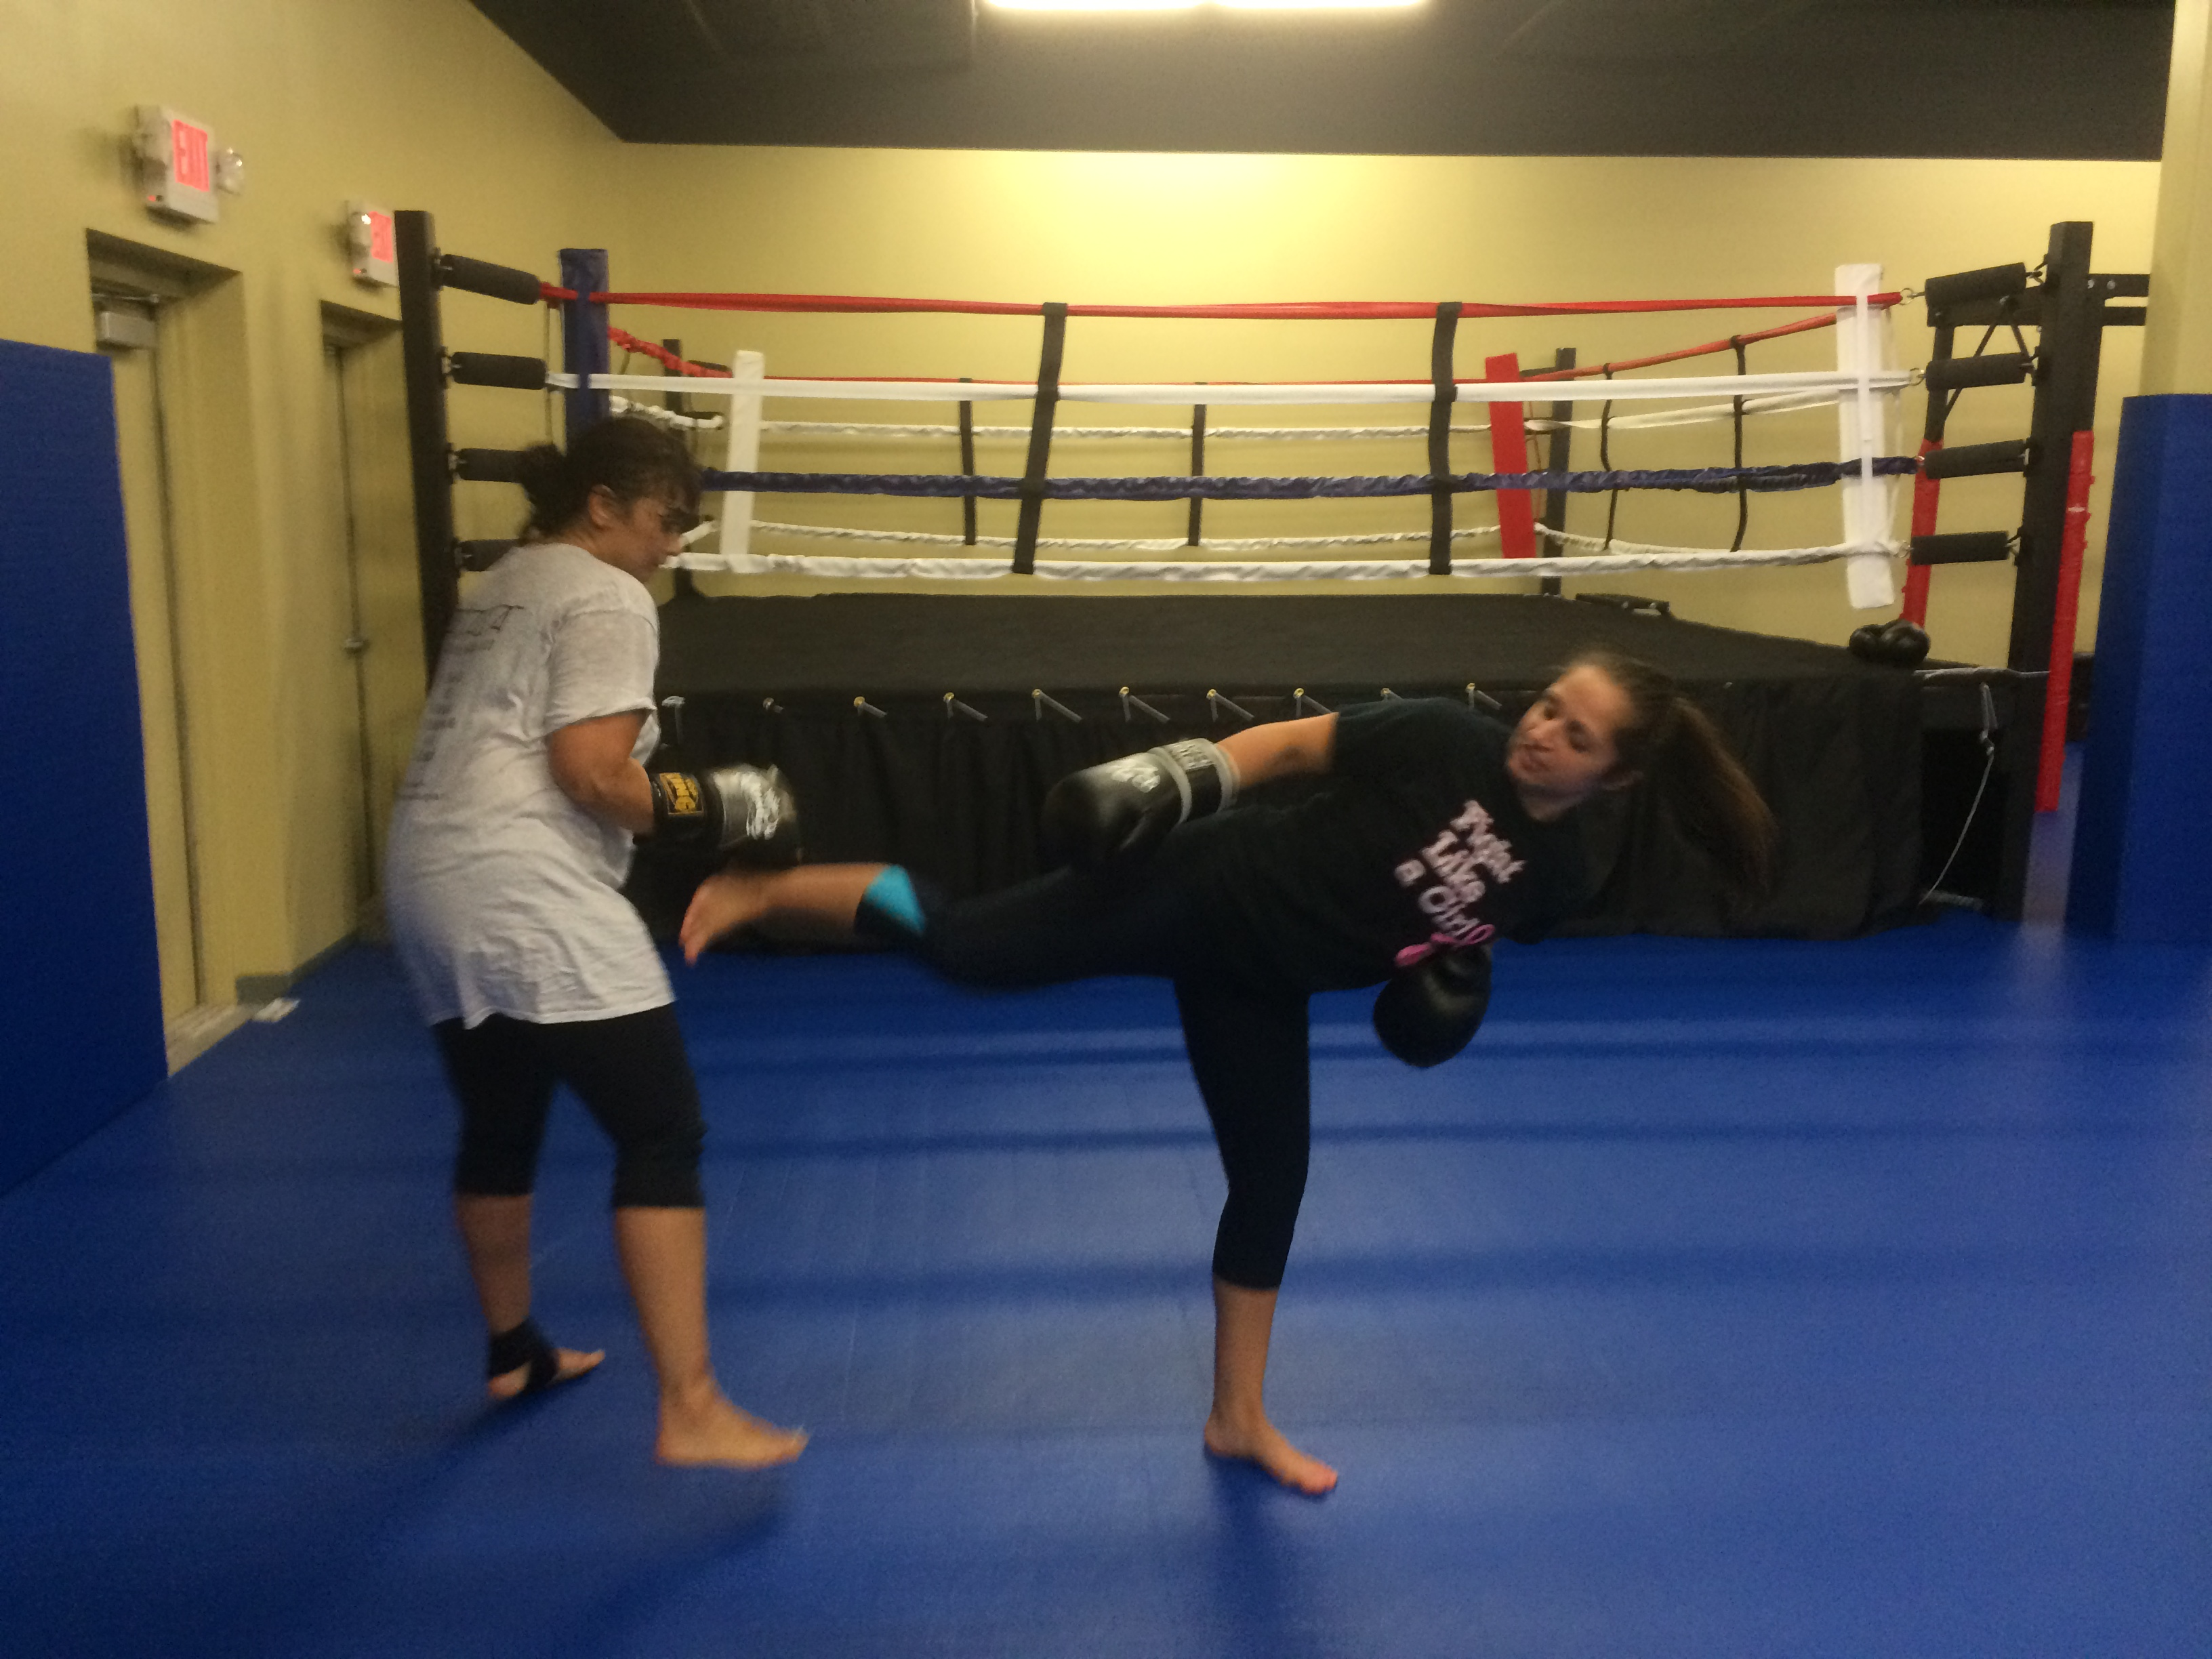 Valhalla Academy of Martial Arts image 7